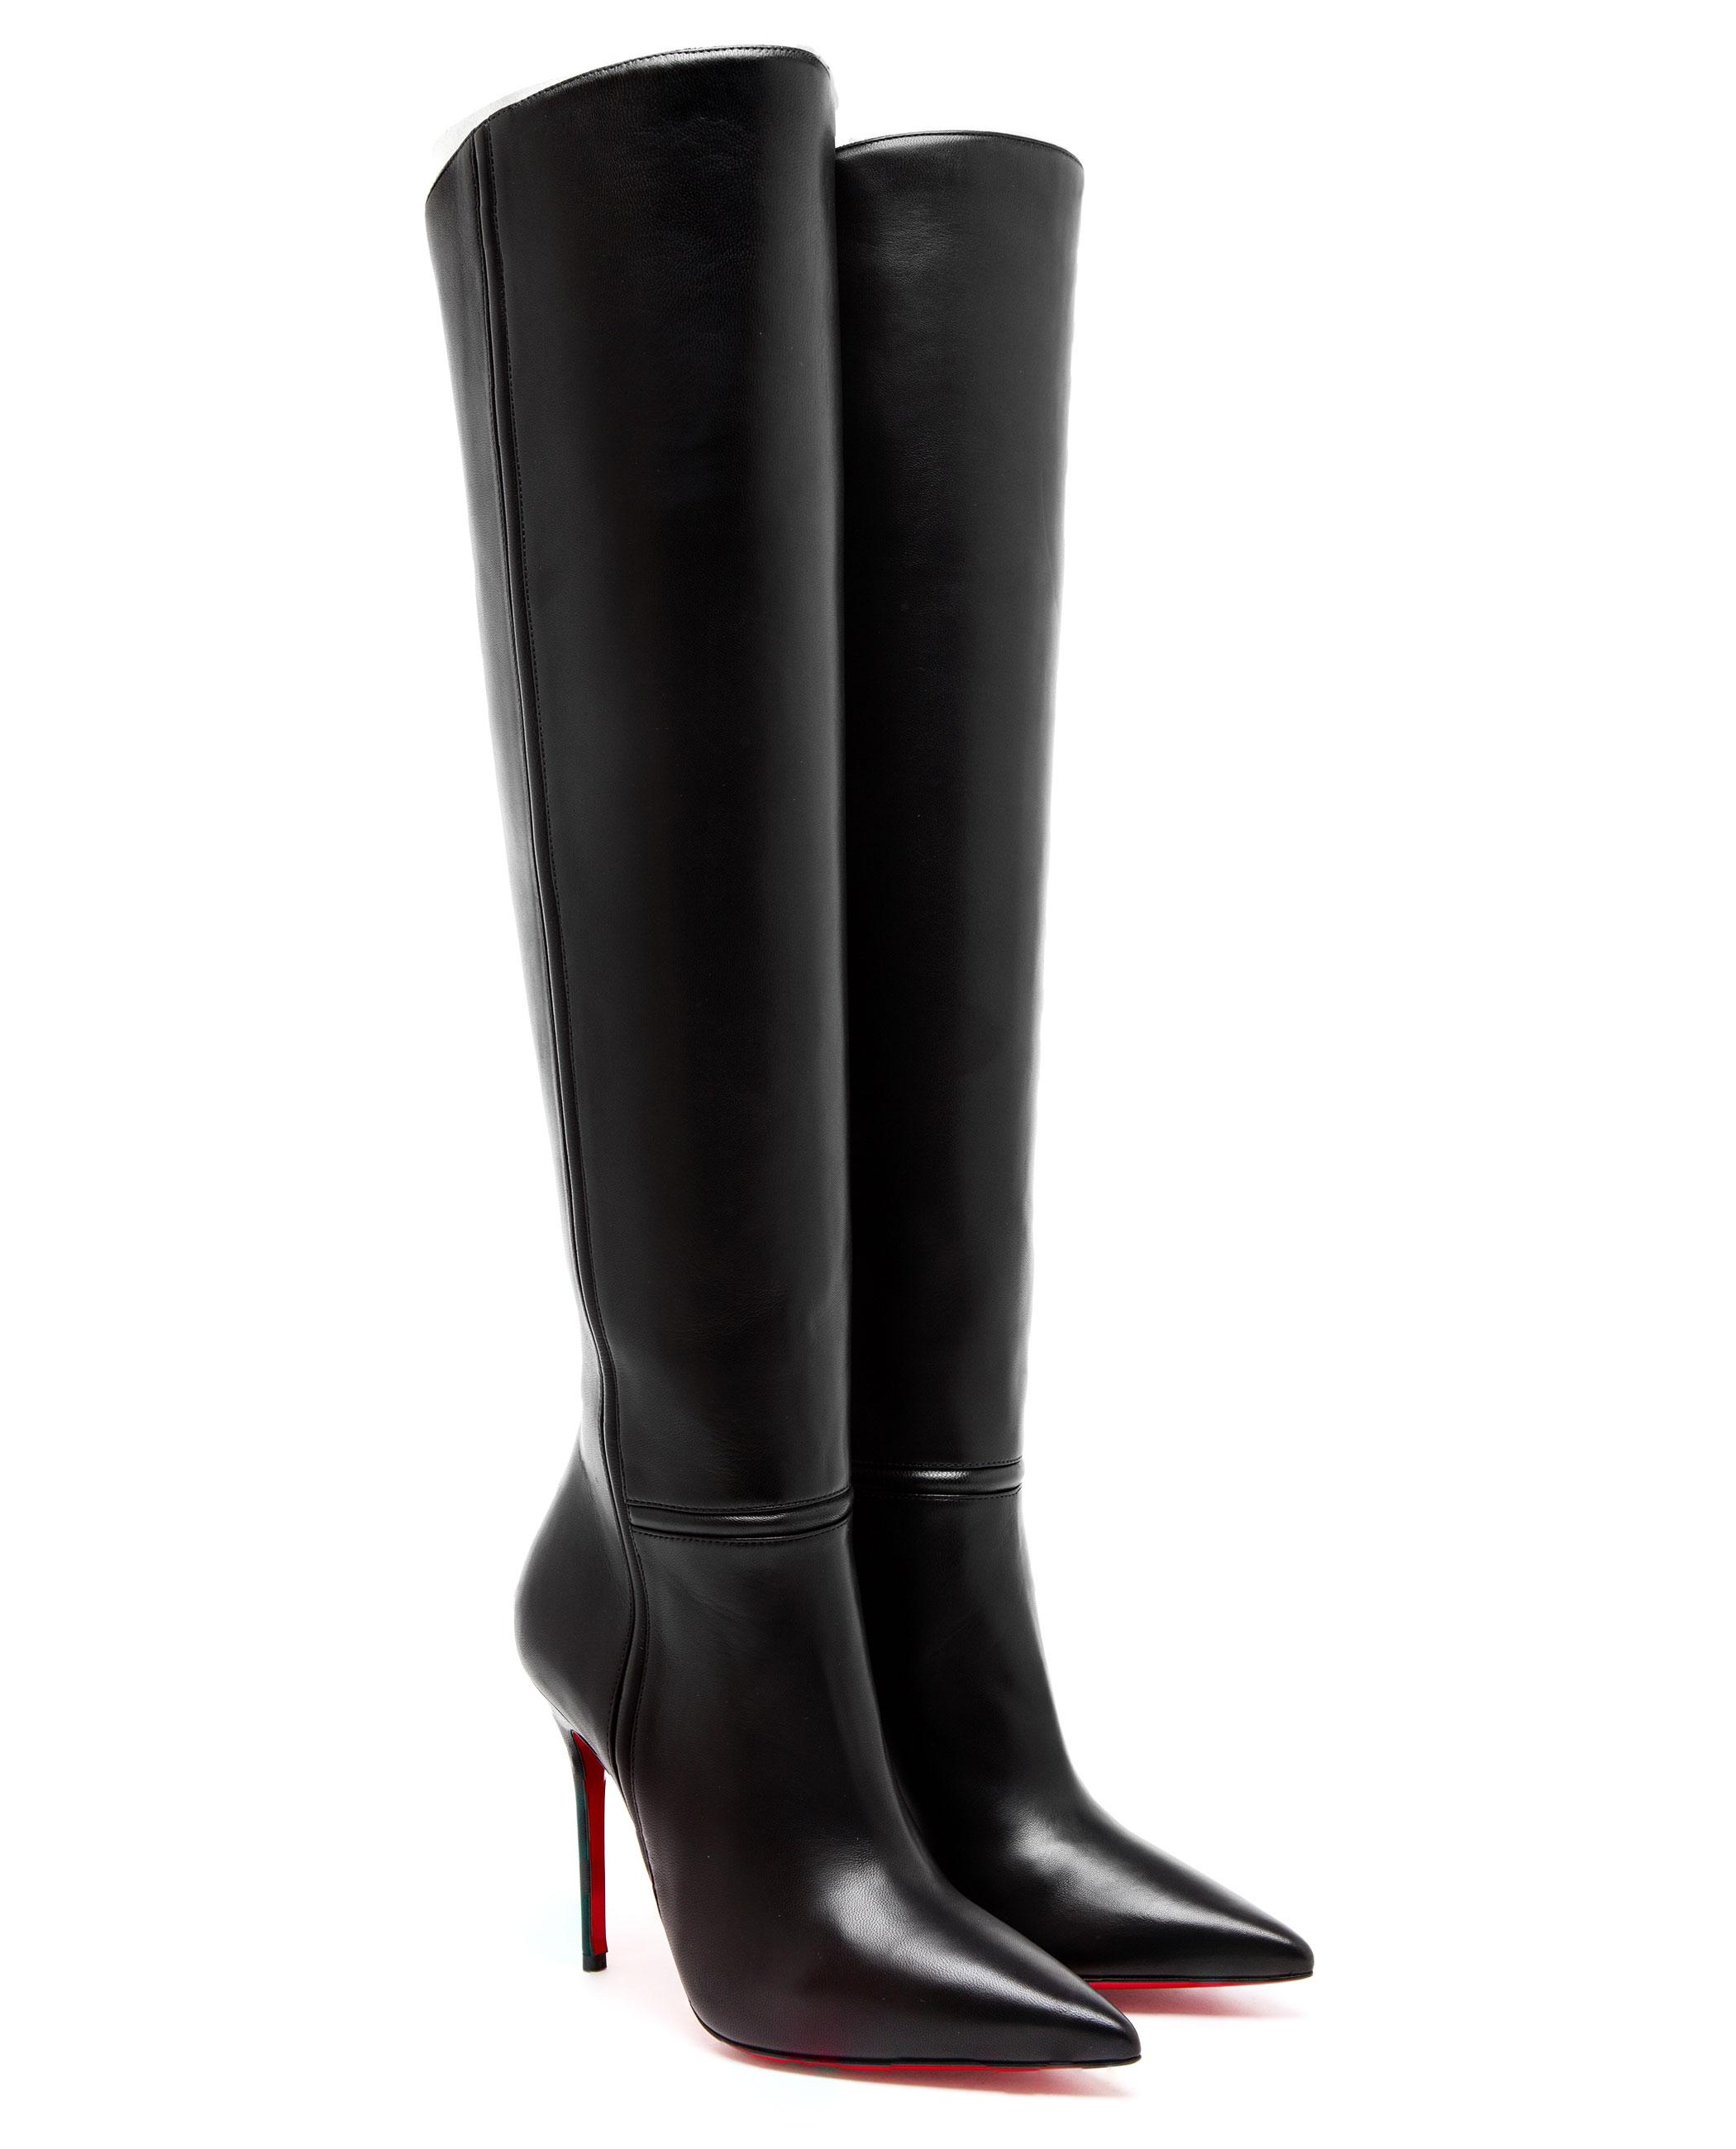 christian louboutin armurabotta leather kneehigh boots in